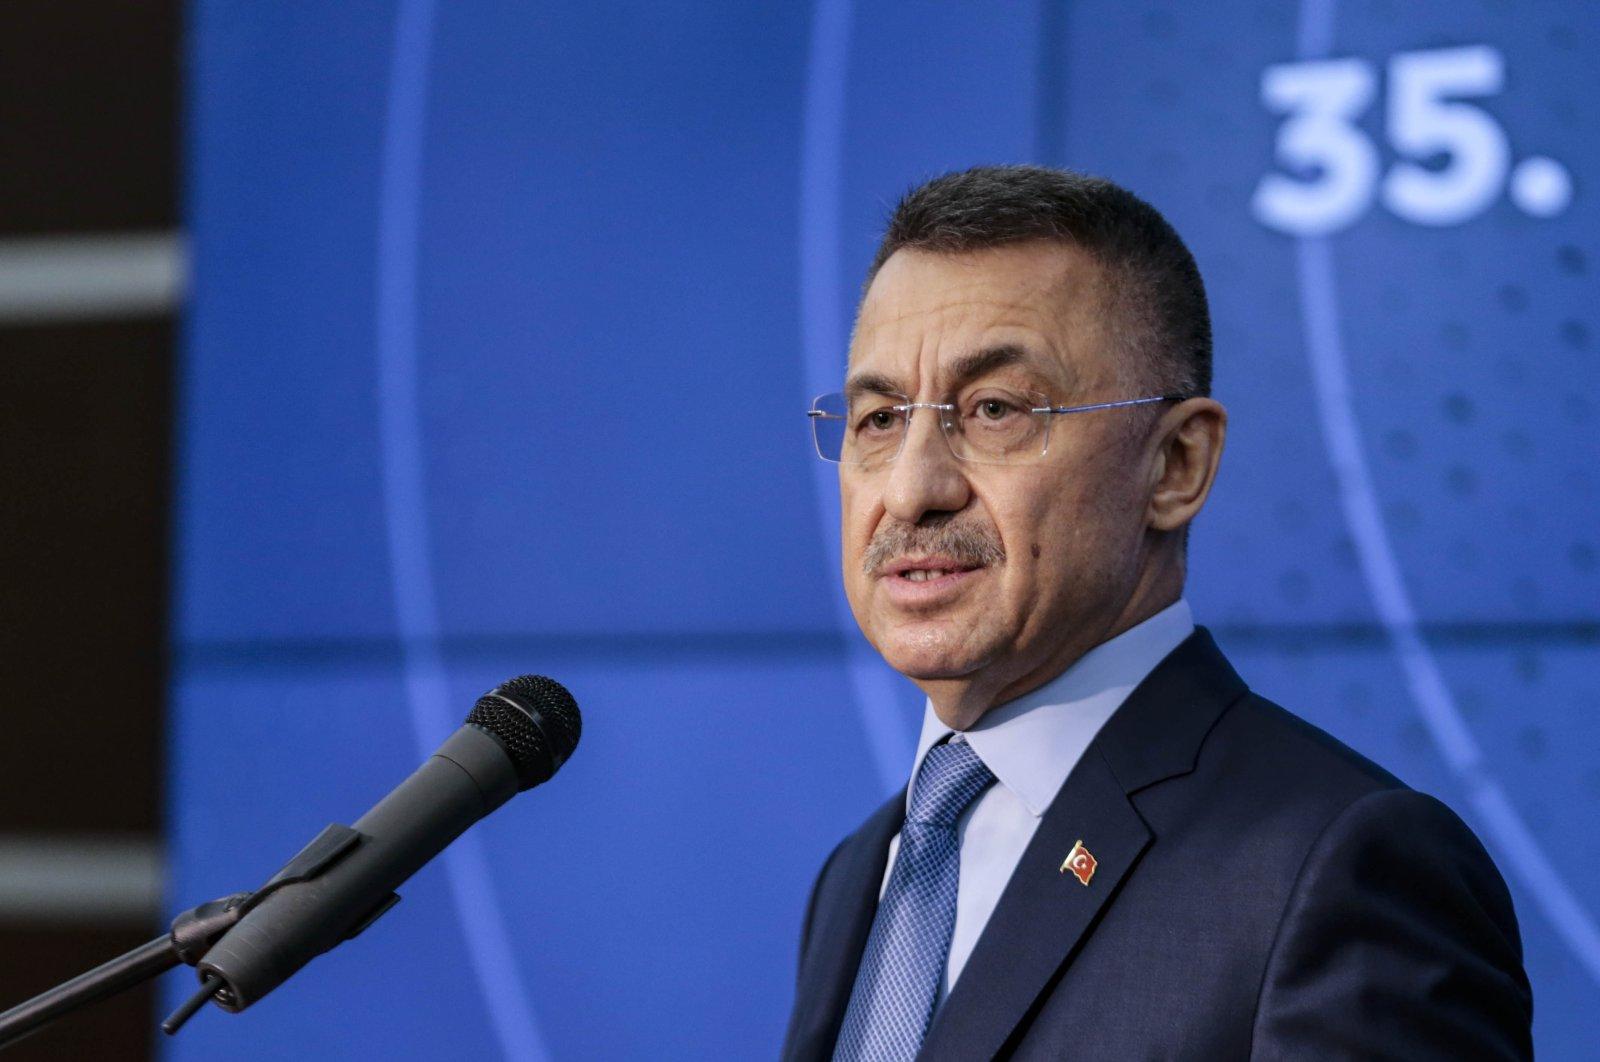 Turkish Vice President Fuat Oktay gives a speech at an event in Ankara, Nov. 6, 2020. (AA)